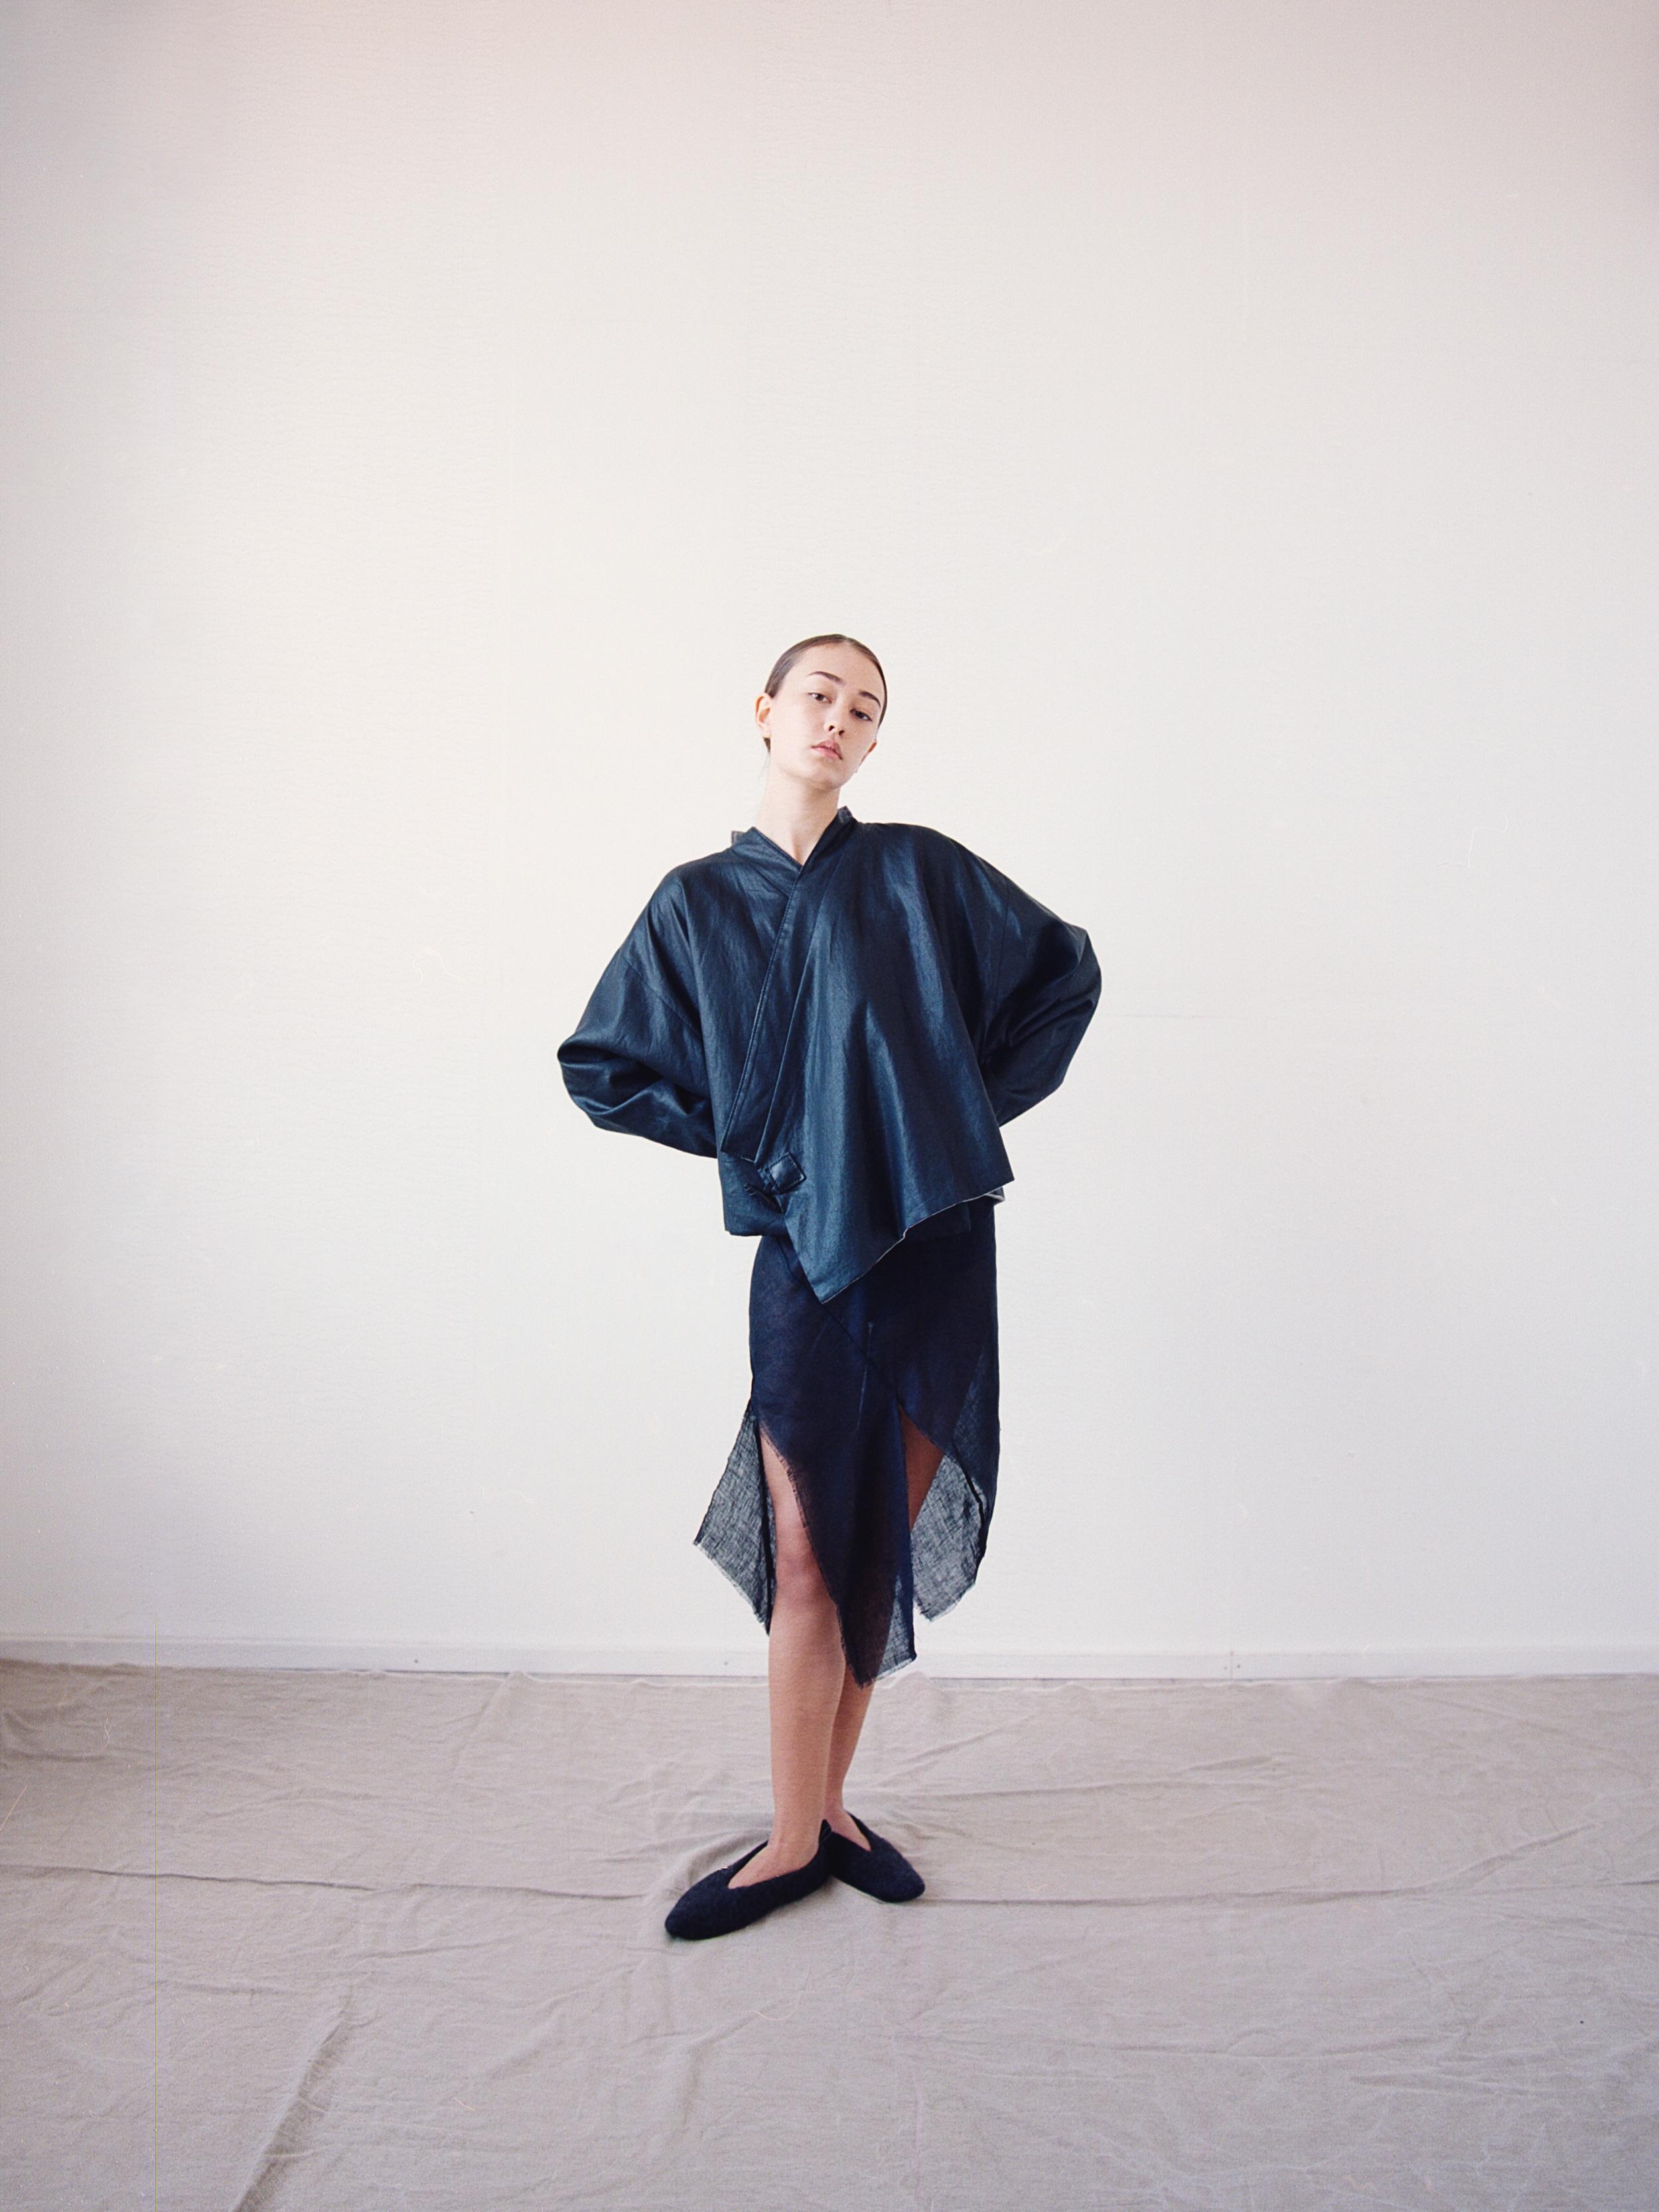 Focus on balance of the essential lines, shapes and structure of the garments. Акцент на гармоничном сочетании базовых линий, формы и структуры изделий -